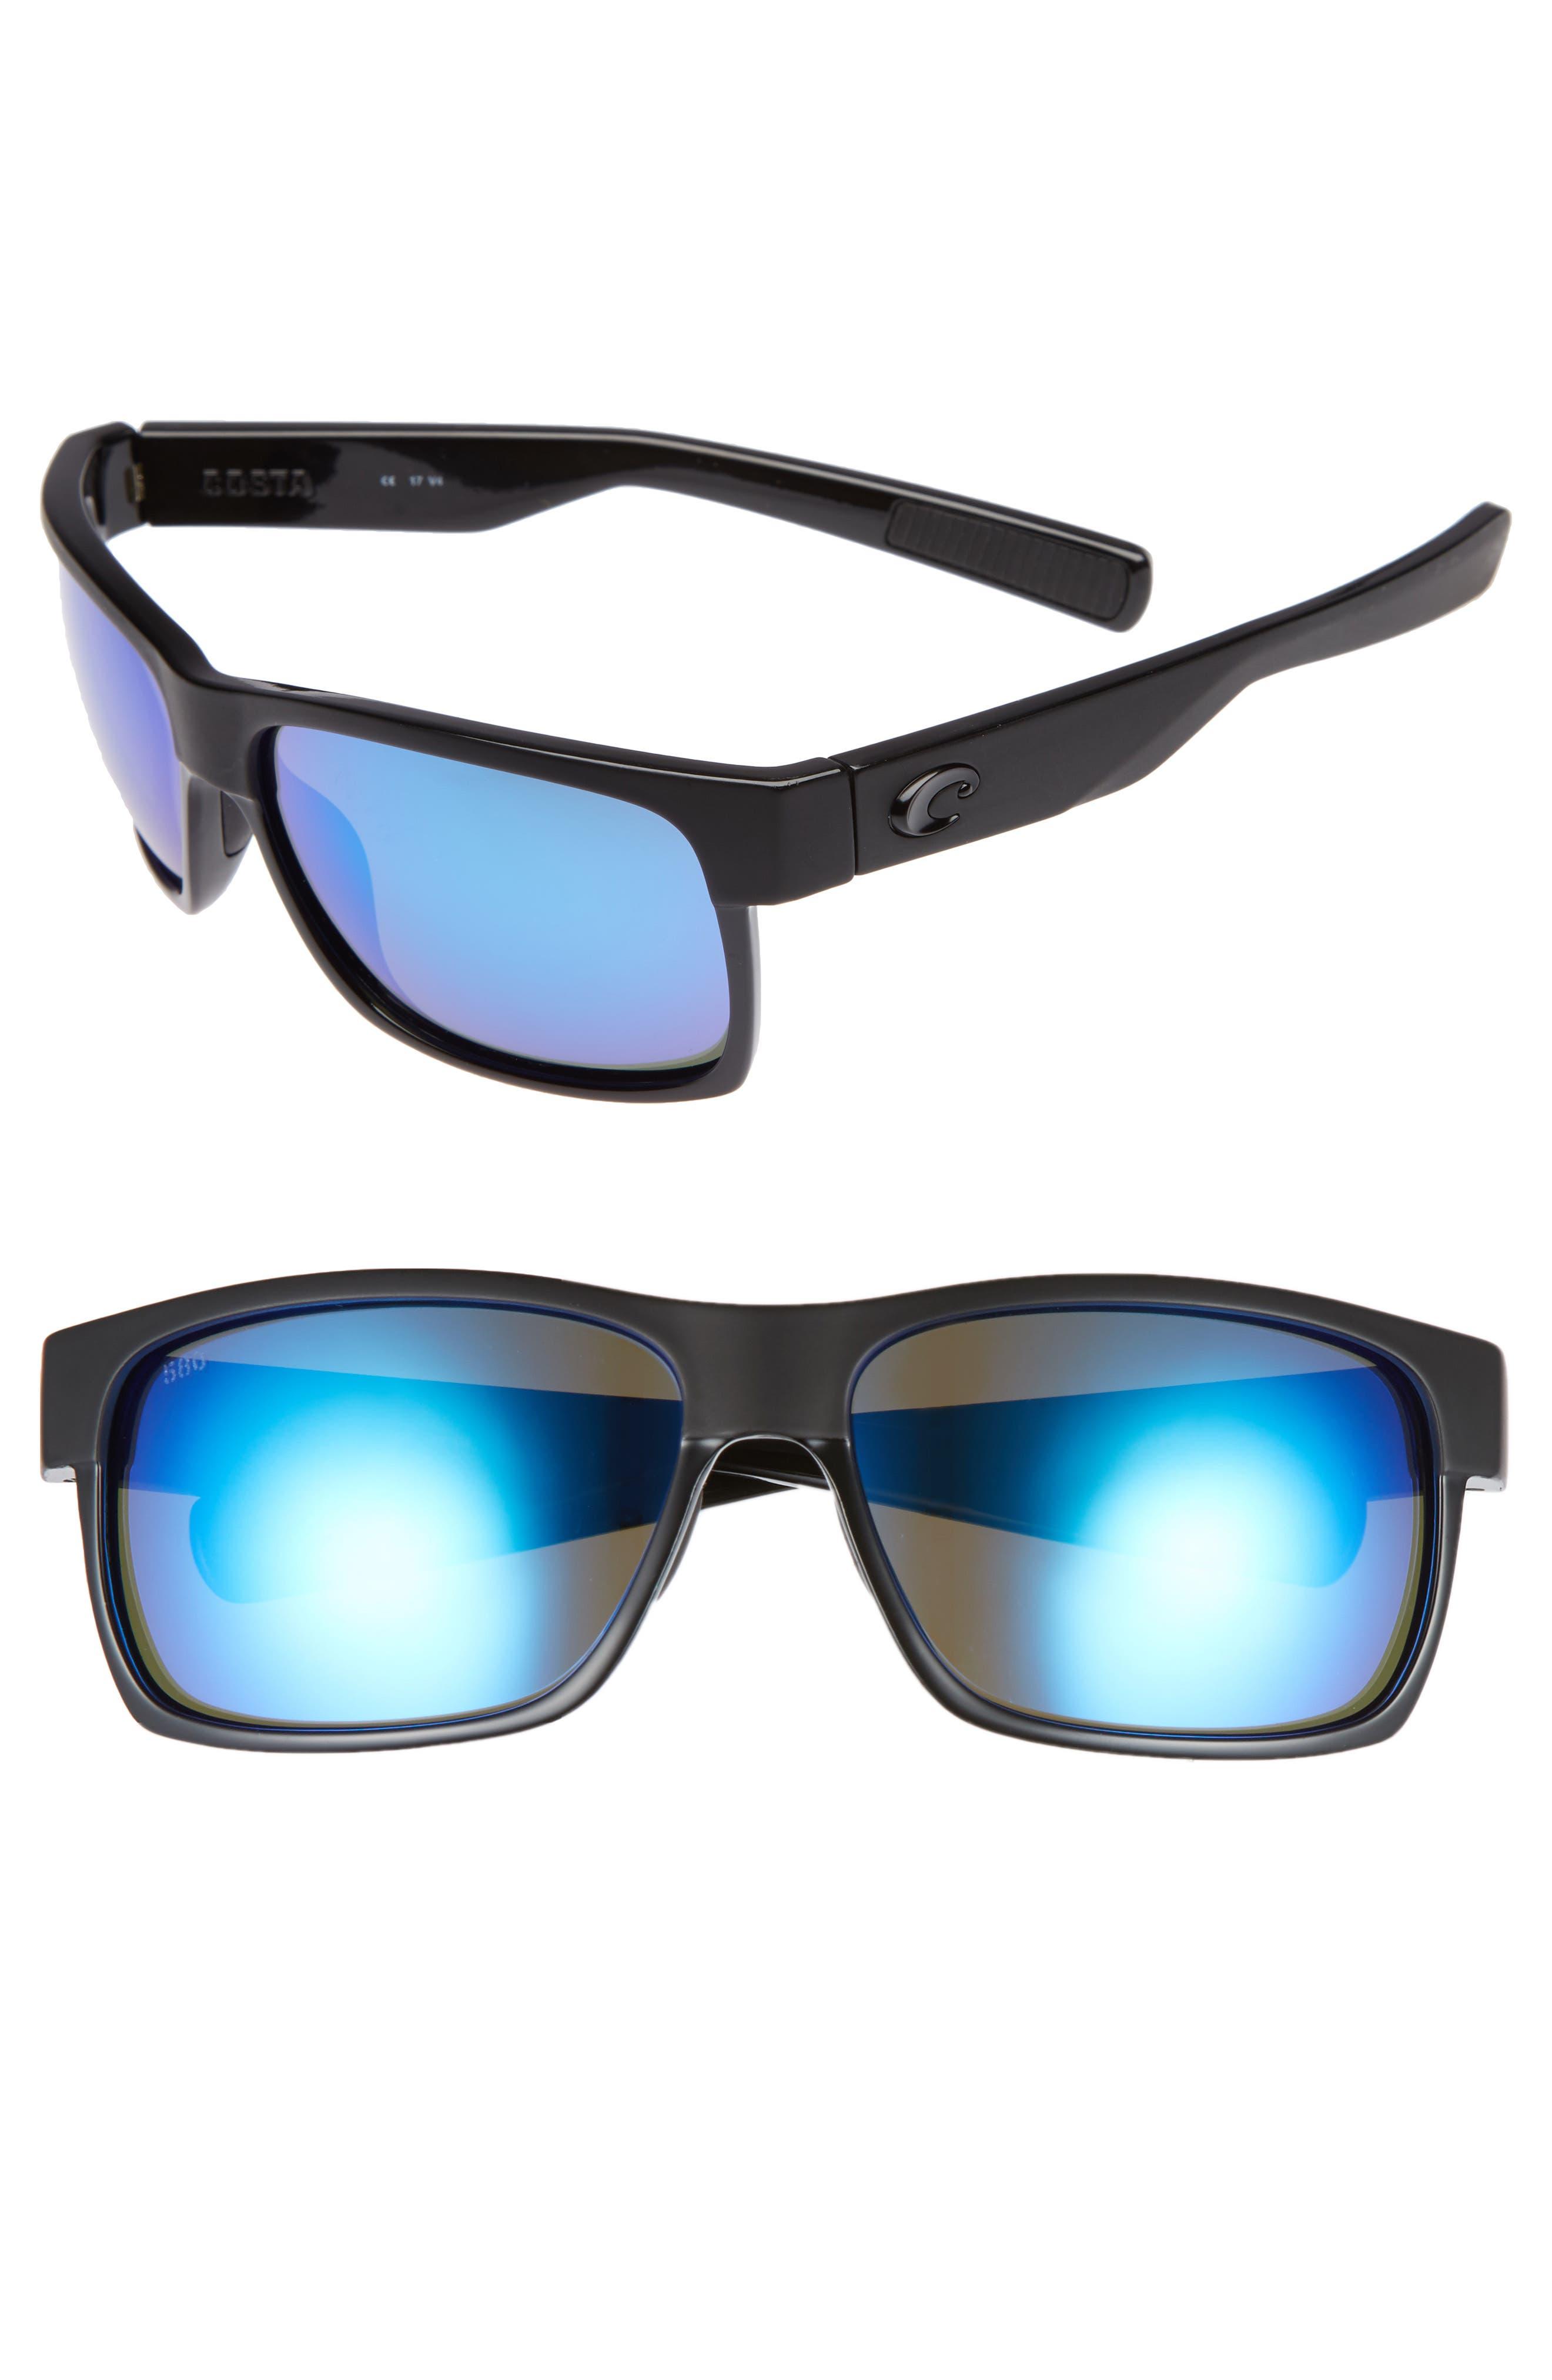 Half Moon 60mm Polarized Sunglasses,                         Main,                         color, BLACK/ BLUE MIRROR